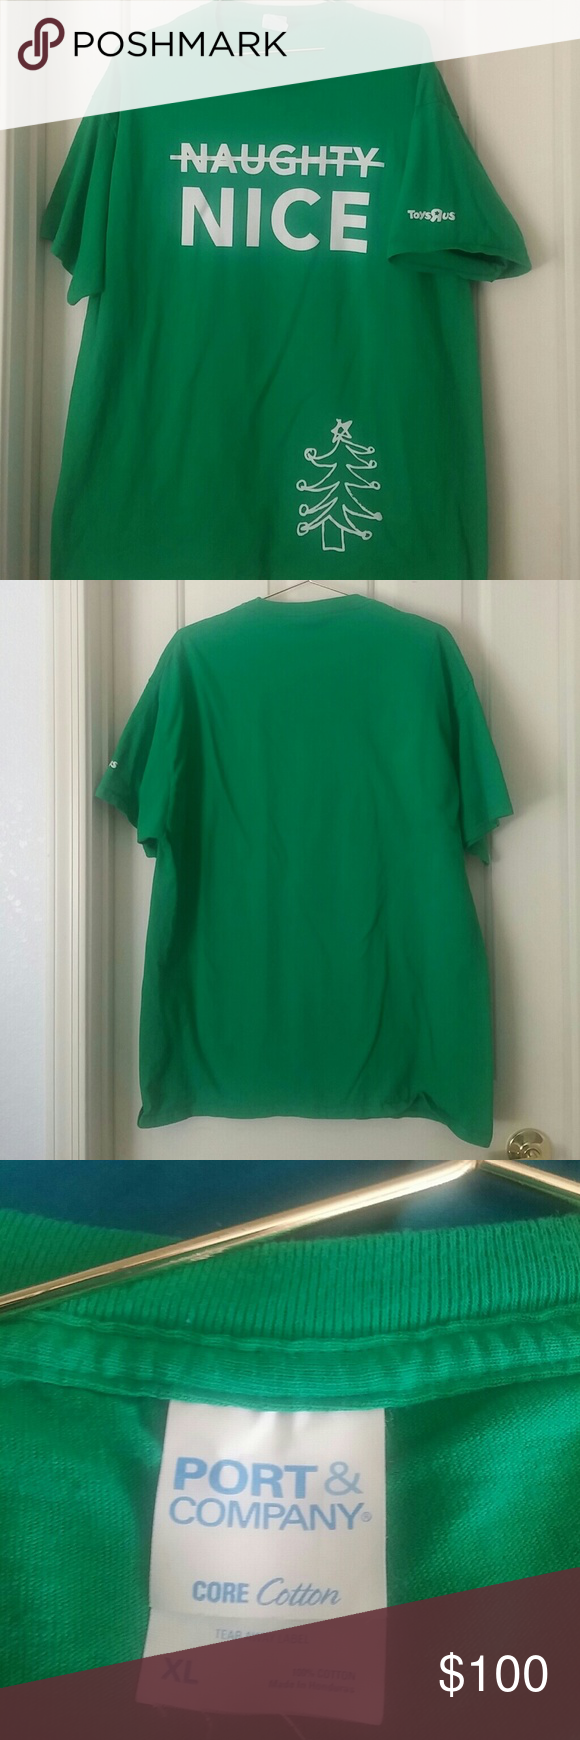 44b8254b28e 100 Percent Cotton Clergy Shirts - BCD Tofu House